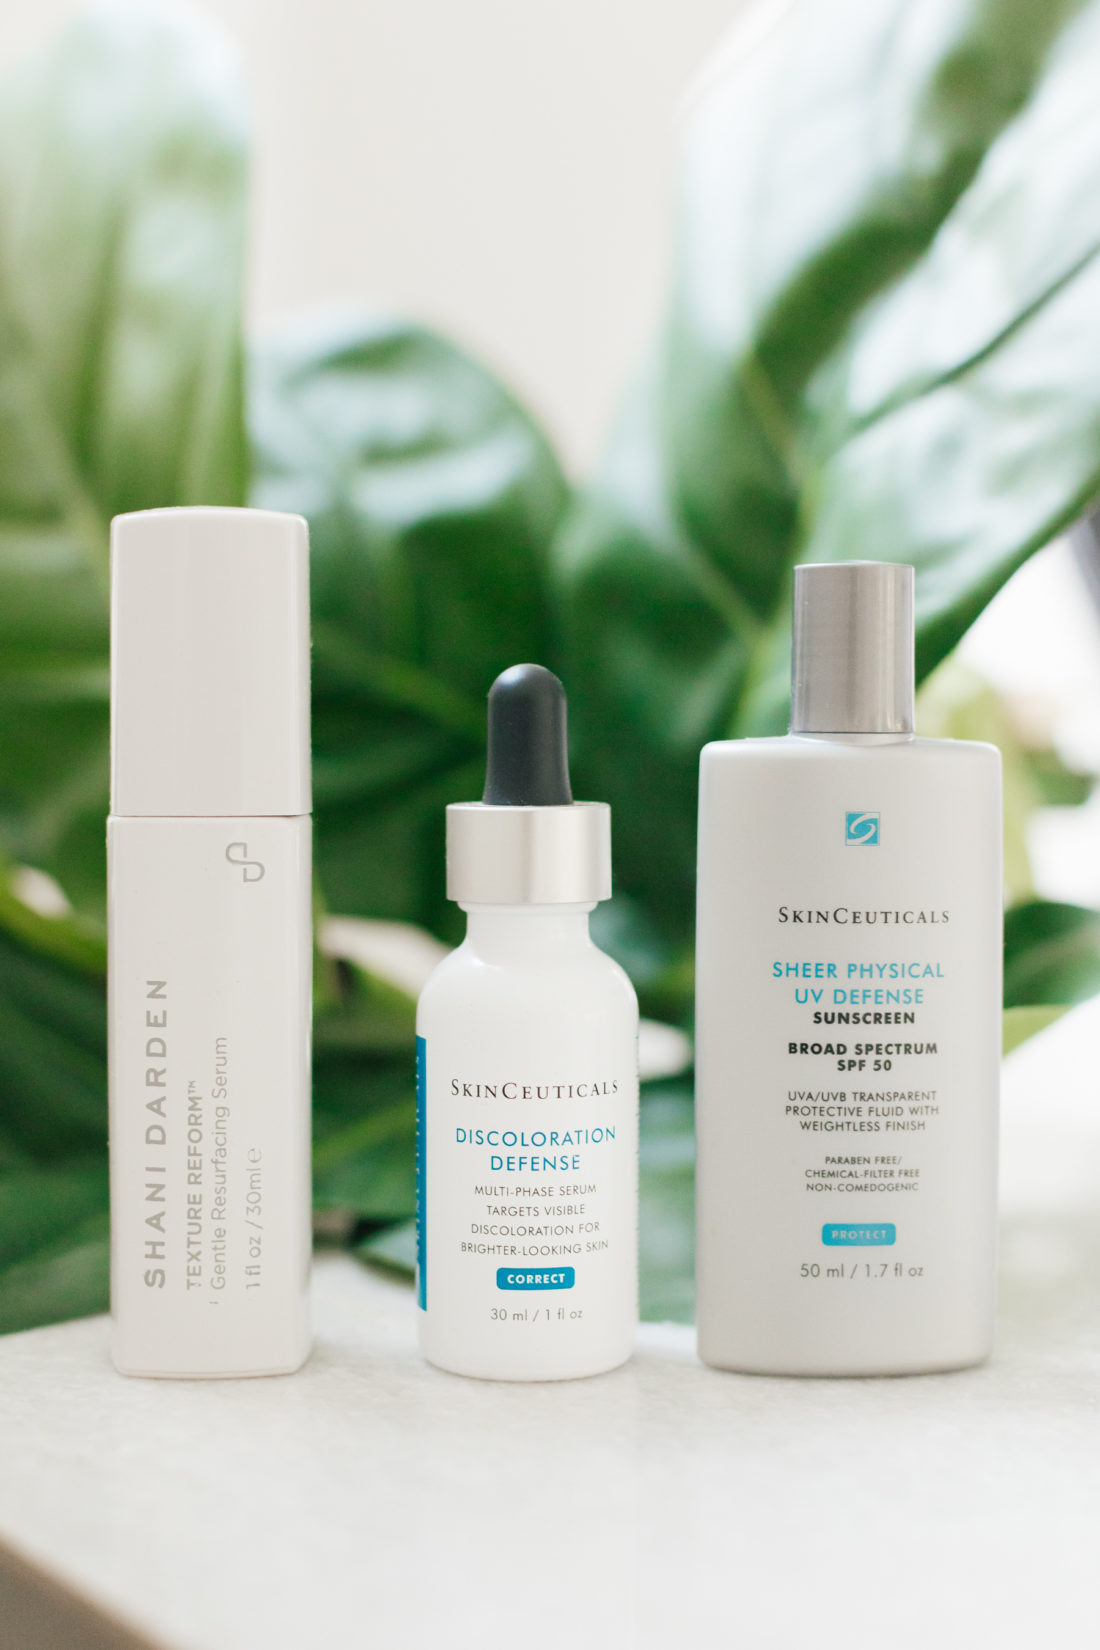 Eva Amurri Martino's go-to skincare products for fading melanoma spots.